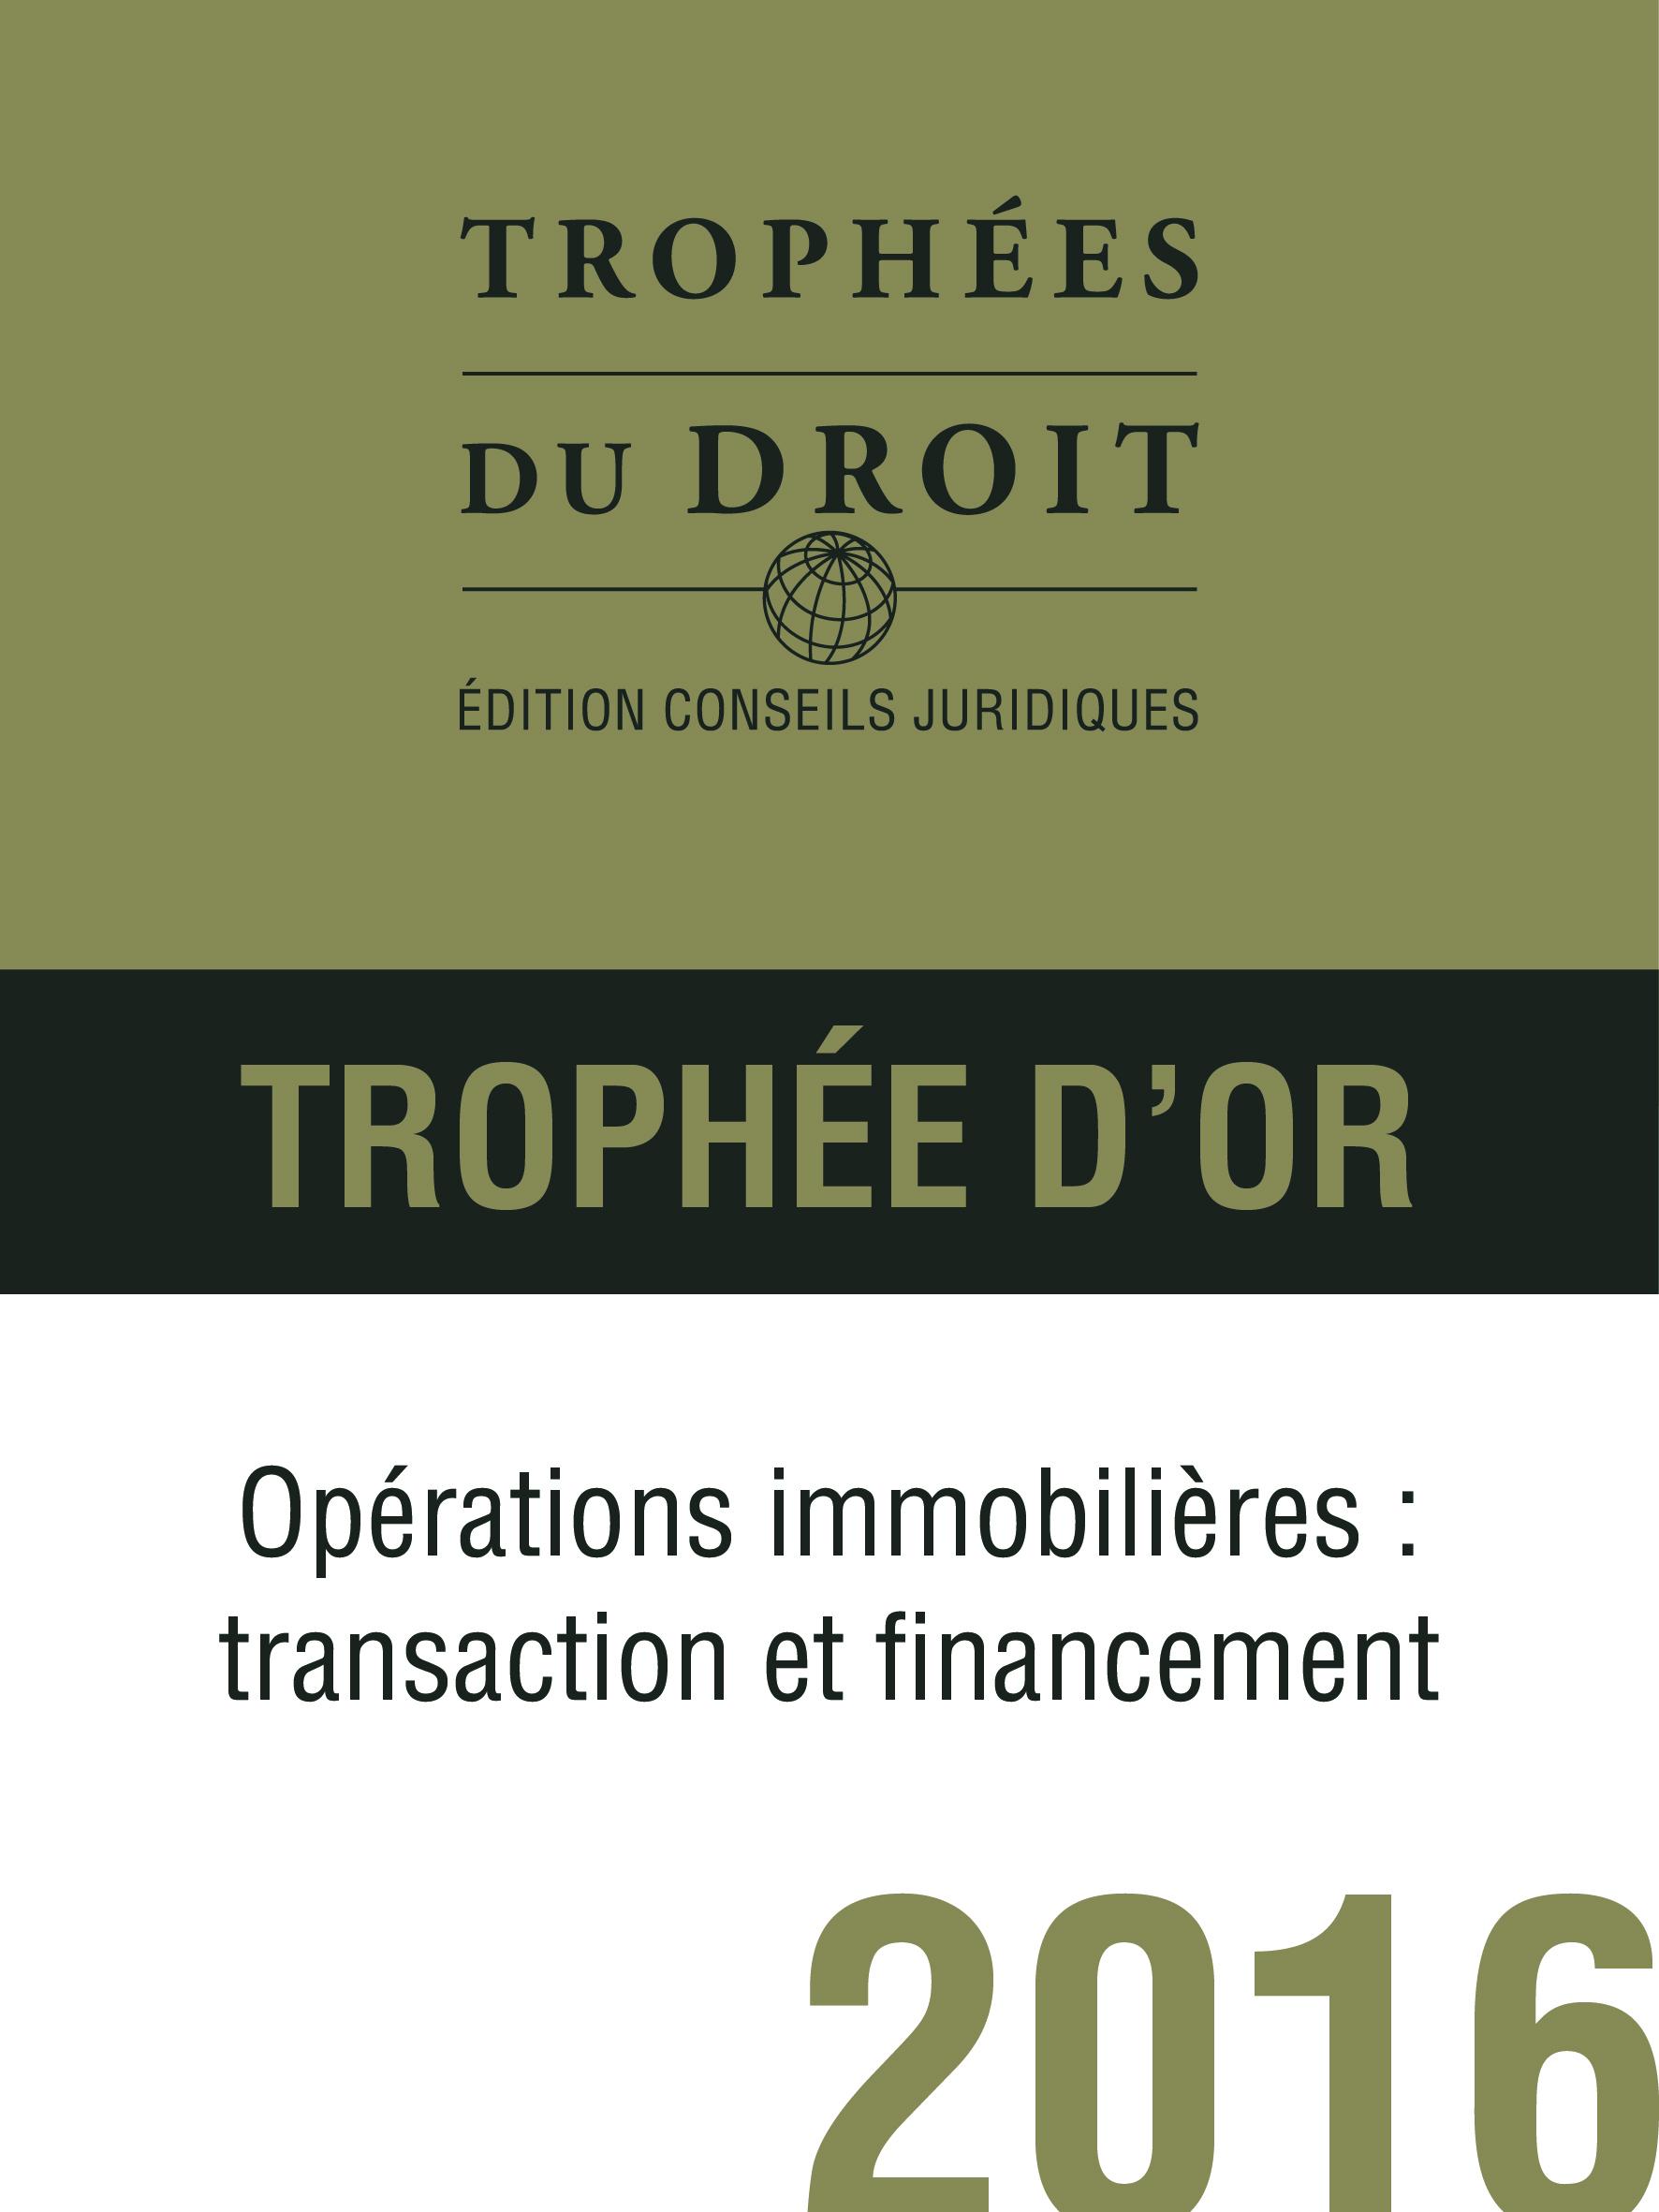 http://www.de-pardieu.com/wp-content/uploads/2016/03/Trophee_Or_Op--rations-immo-2016.jpg